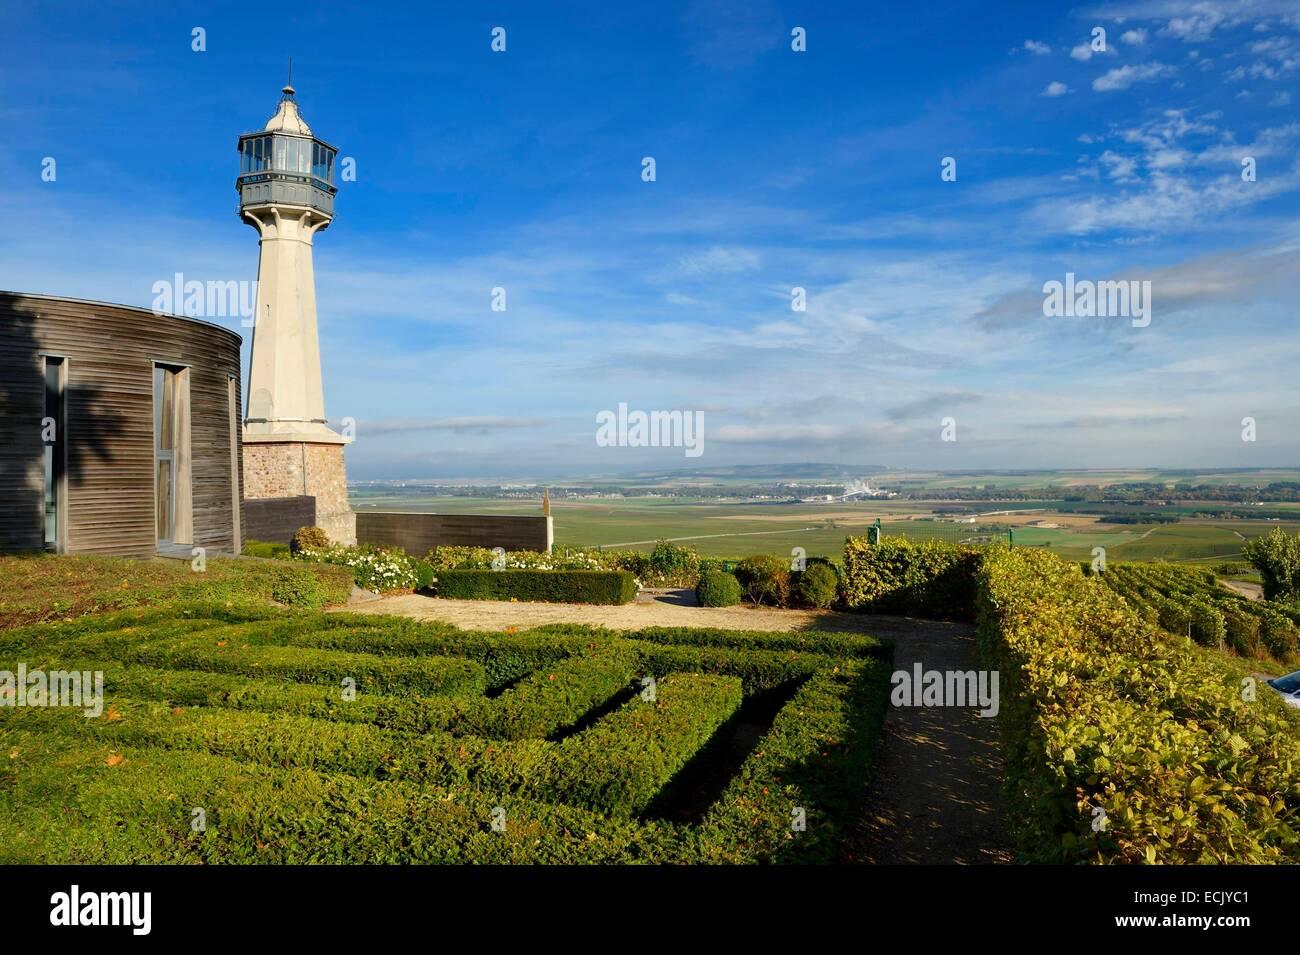 Francia, Marne, Parc naturel de la Montagne de Reims (parco naturale delle Montagne de Reims)s, Verzenay, Faro del Immagini Stock